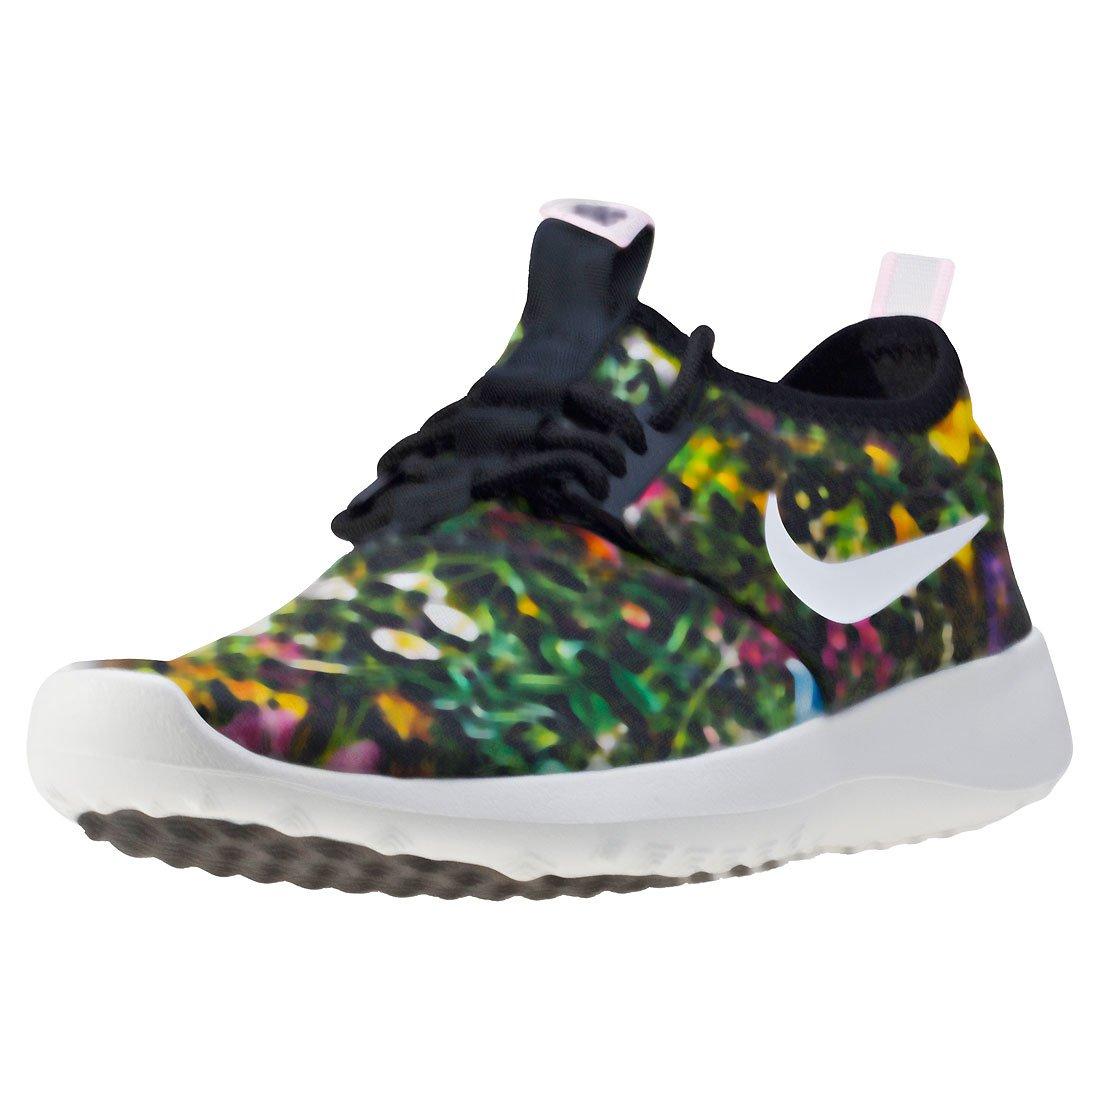 Nike Juvenate Se Womens Style: 862335-003 Size: 7.5 M US by NIKE